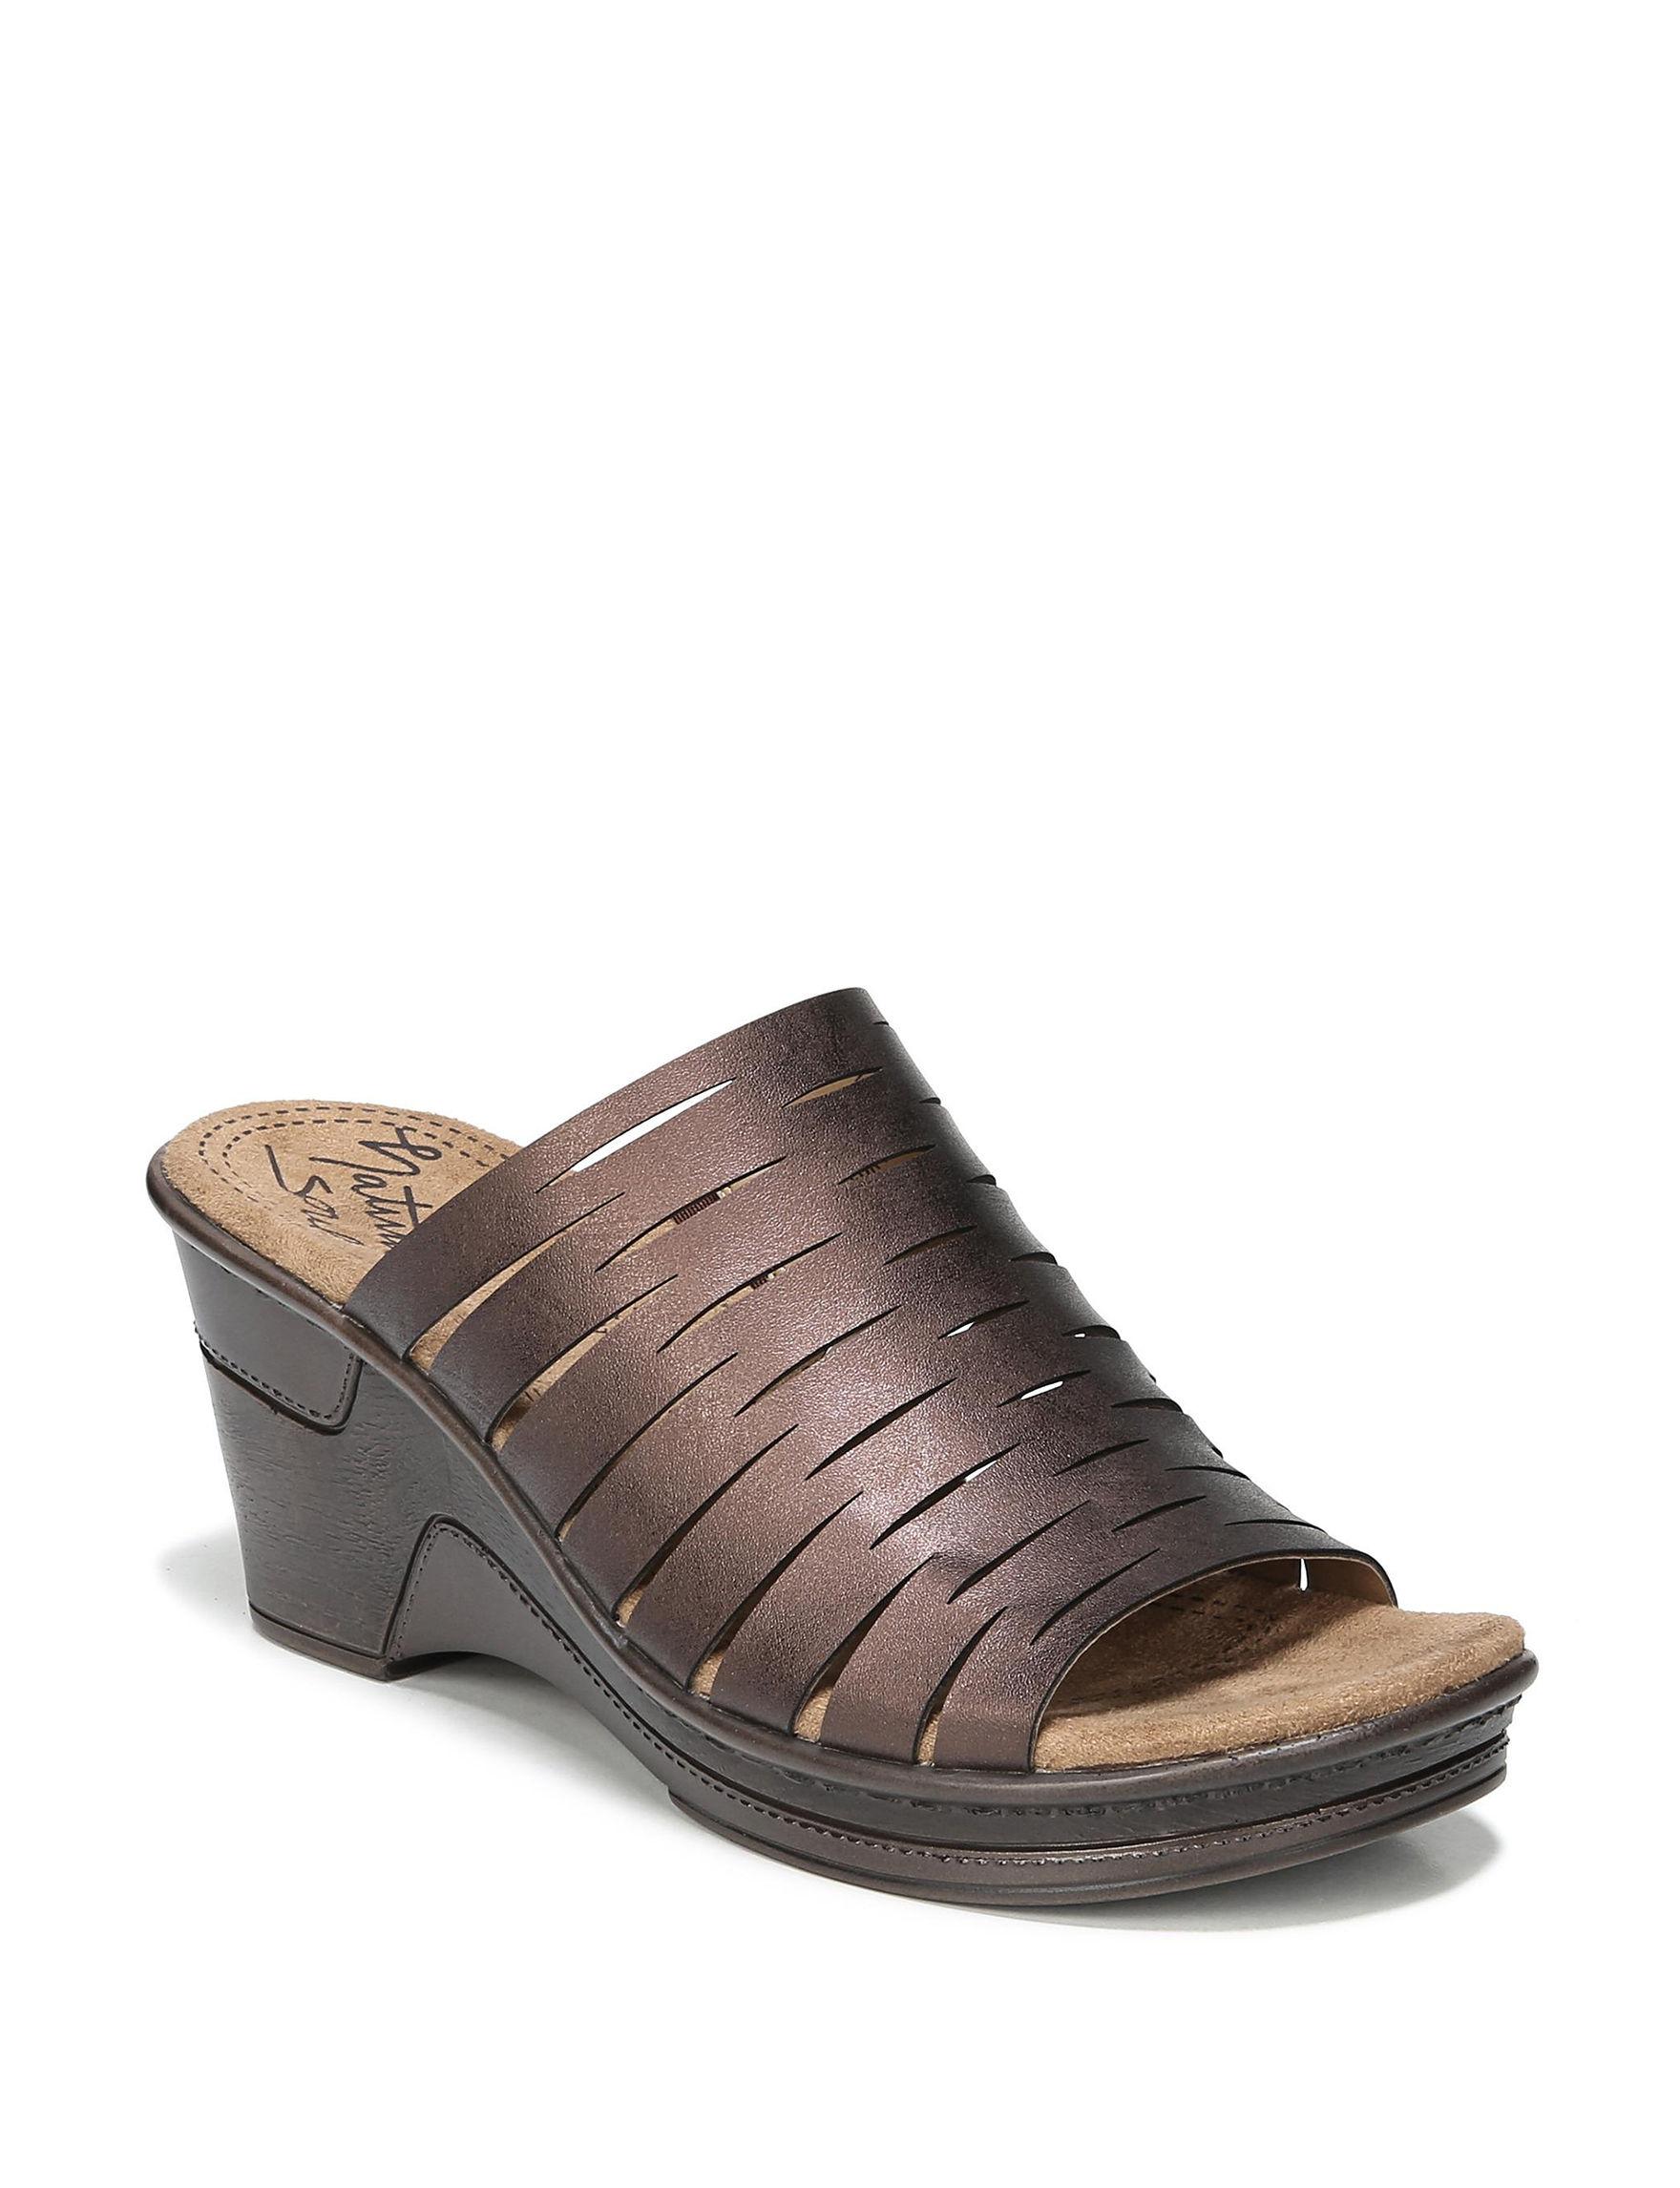 Natural Soul Bronze Wedge Sandals Comfort